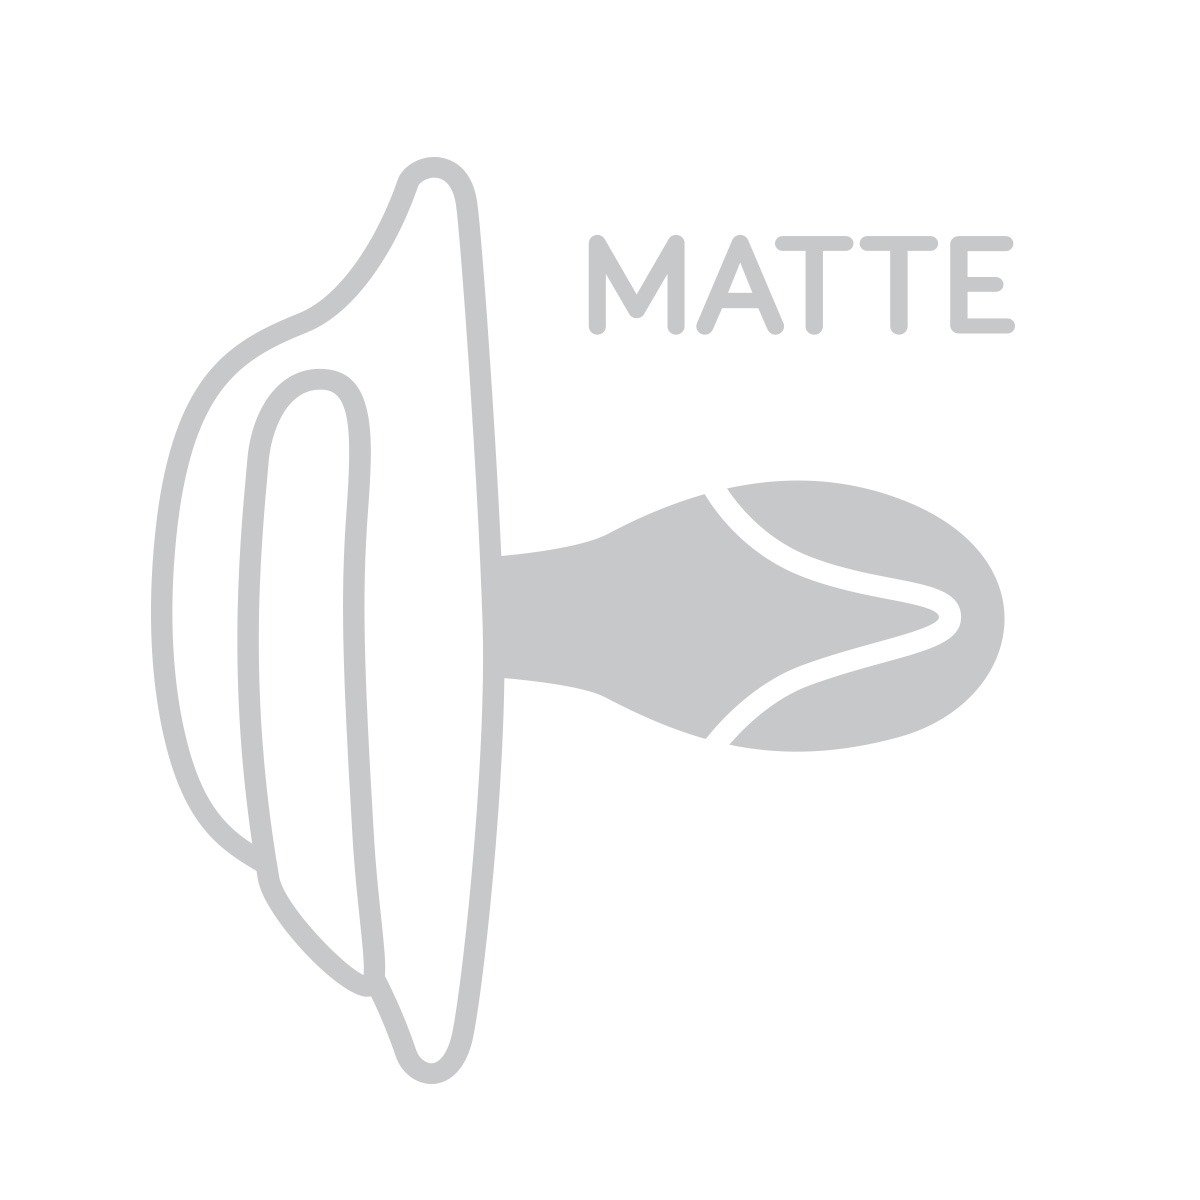 Dudlík symetrický silikonový 3-6m 2 ks - zvìtšit obrázek